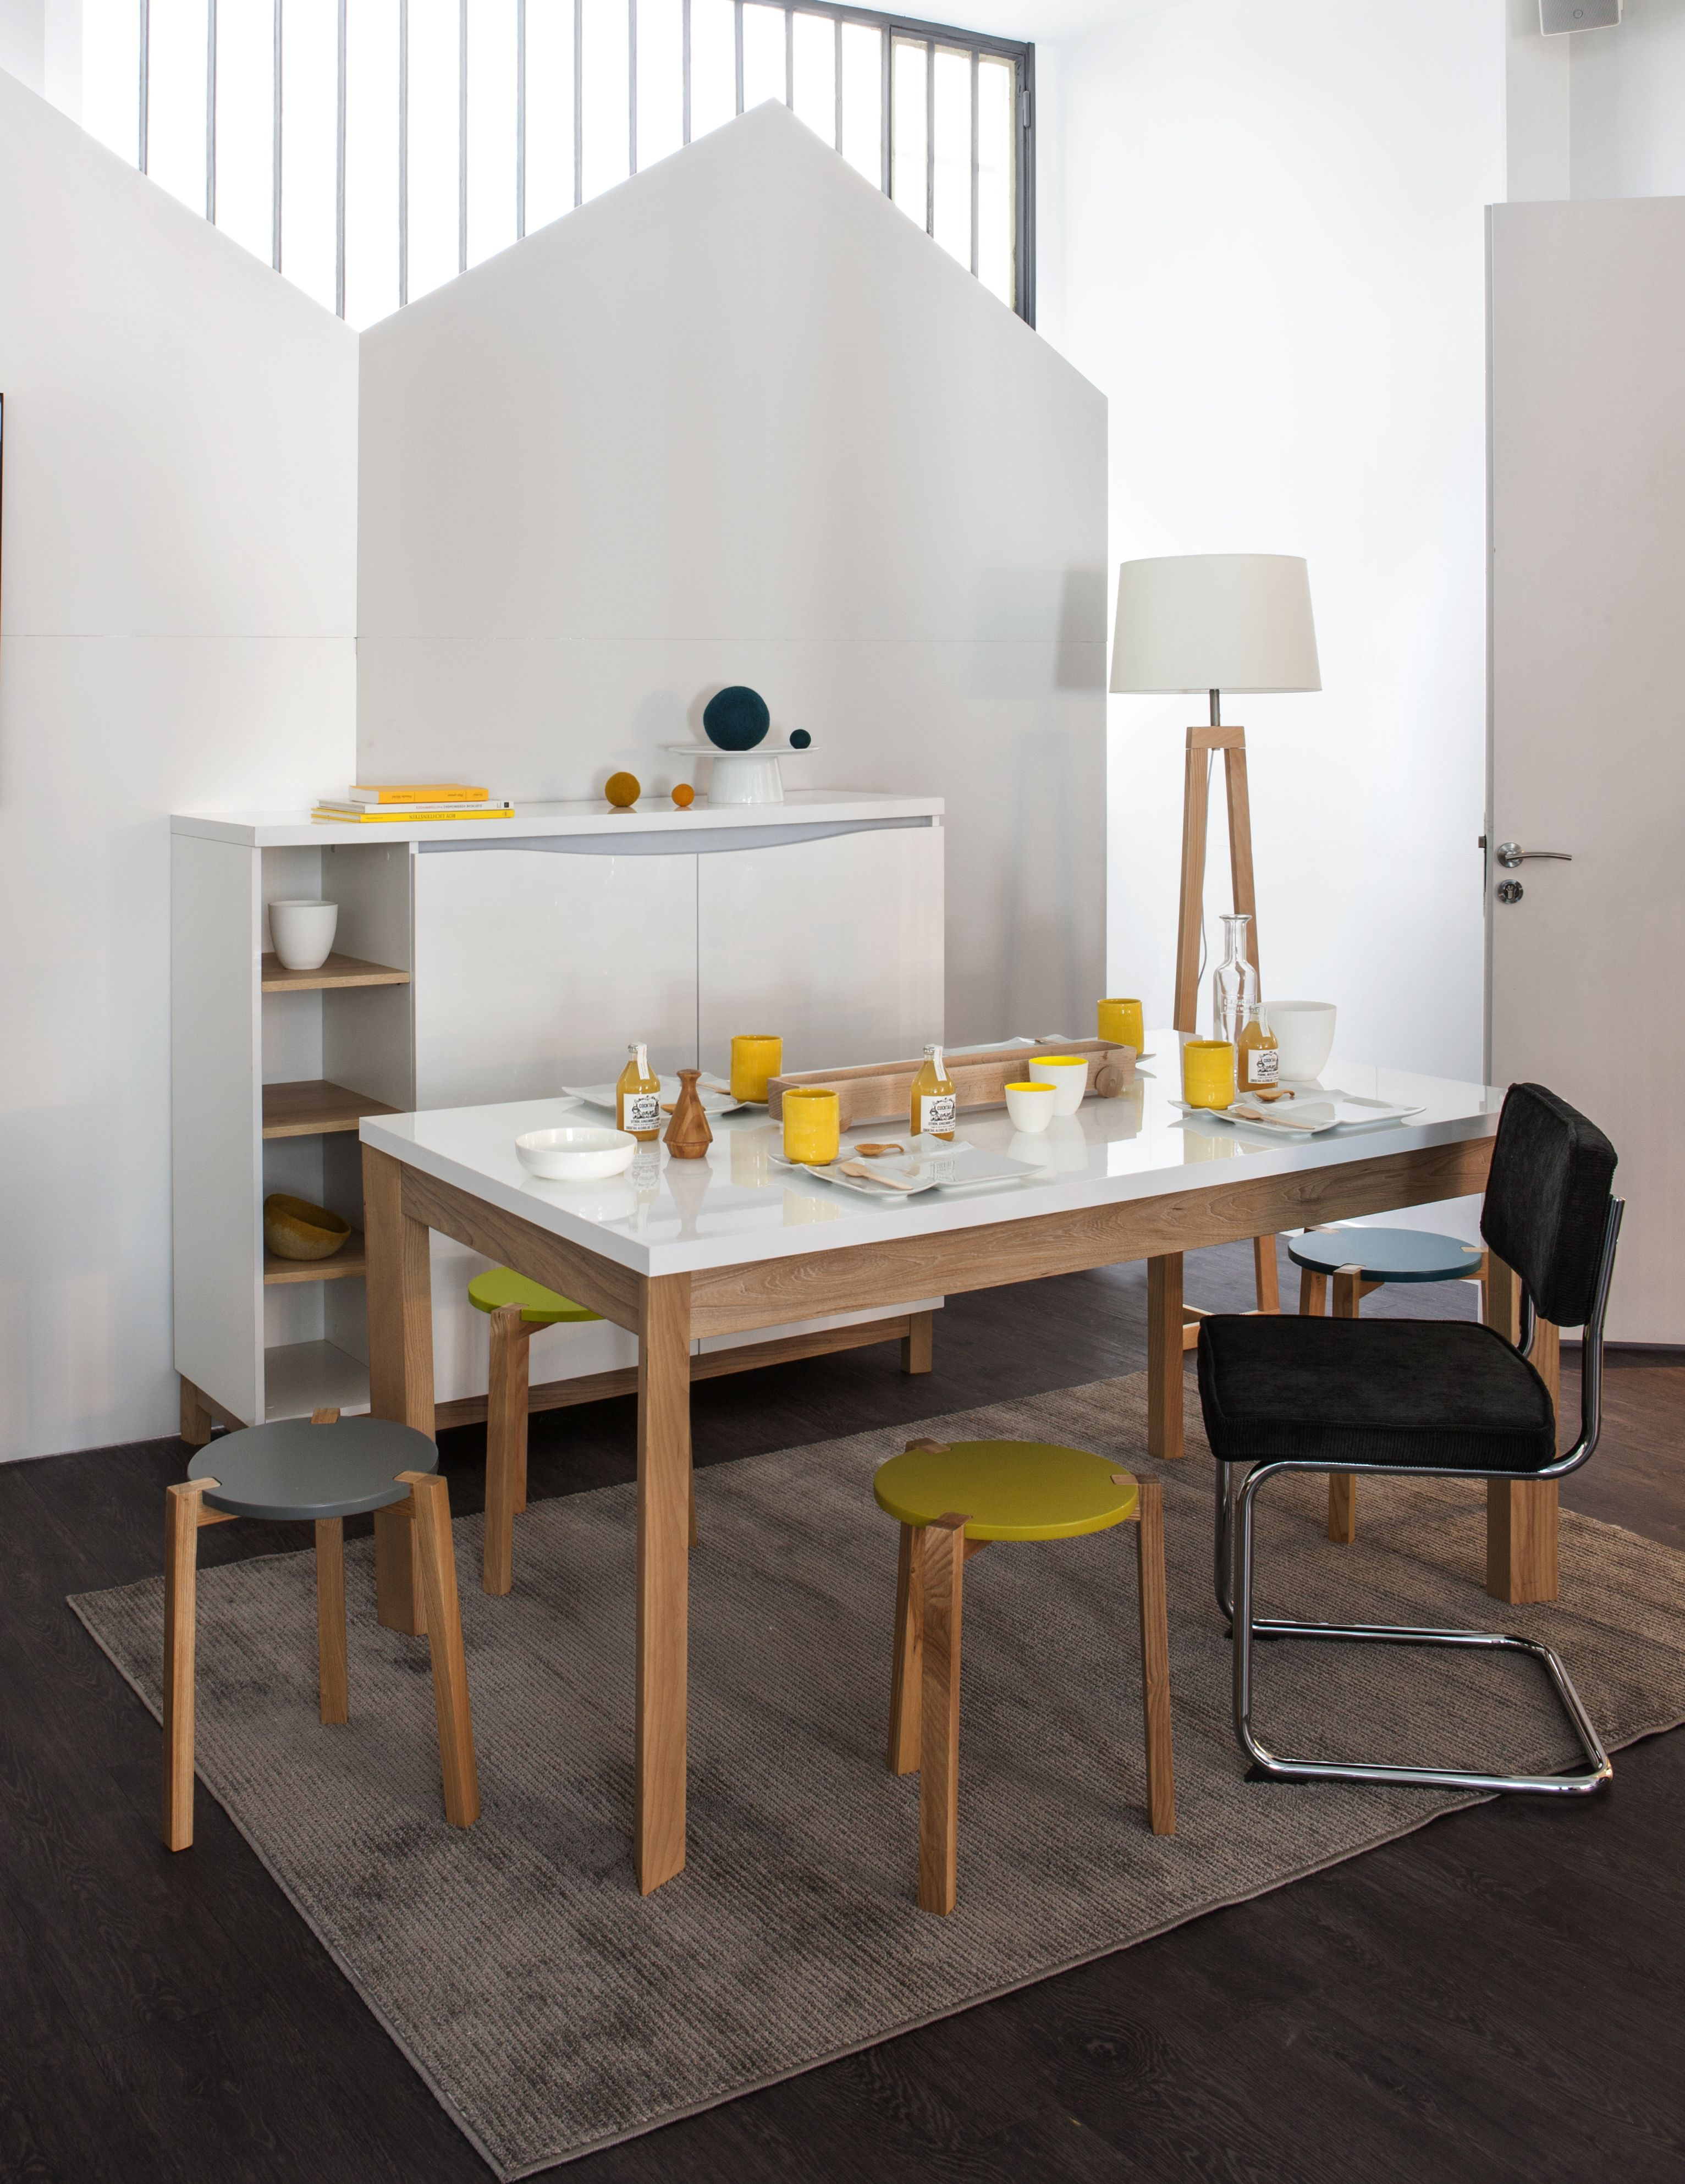 Ambiance d co scandinave table et commode almera - Ambiance tables et chaises reims ...